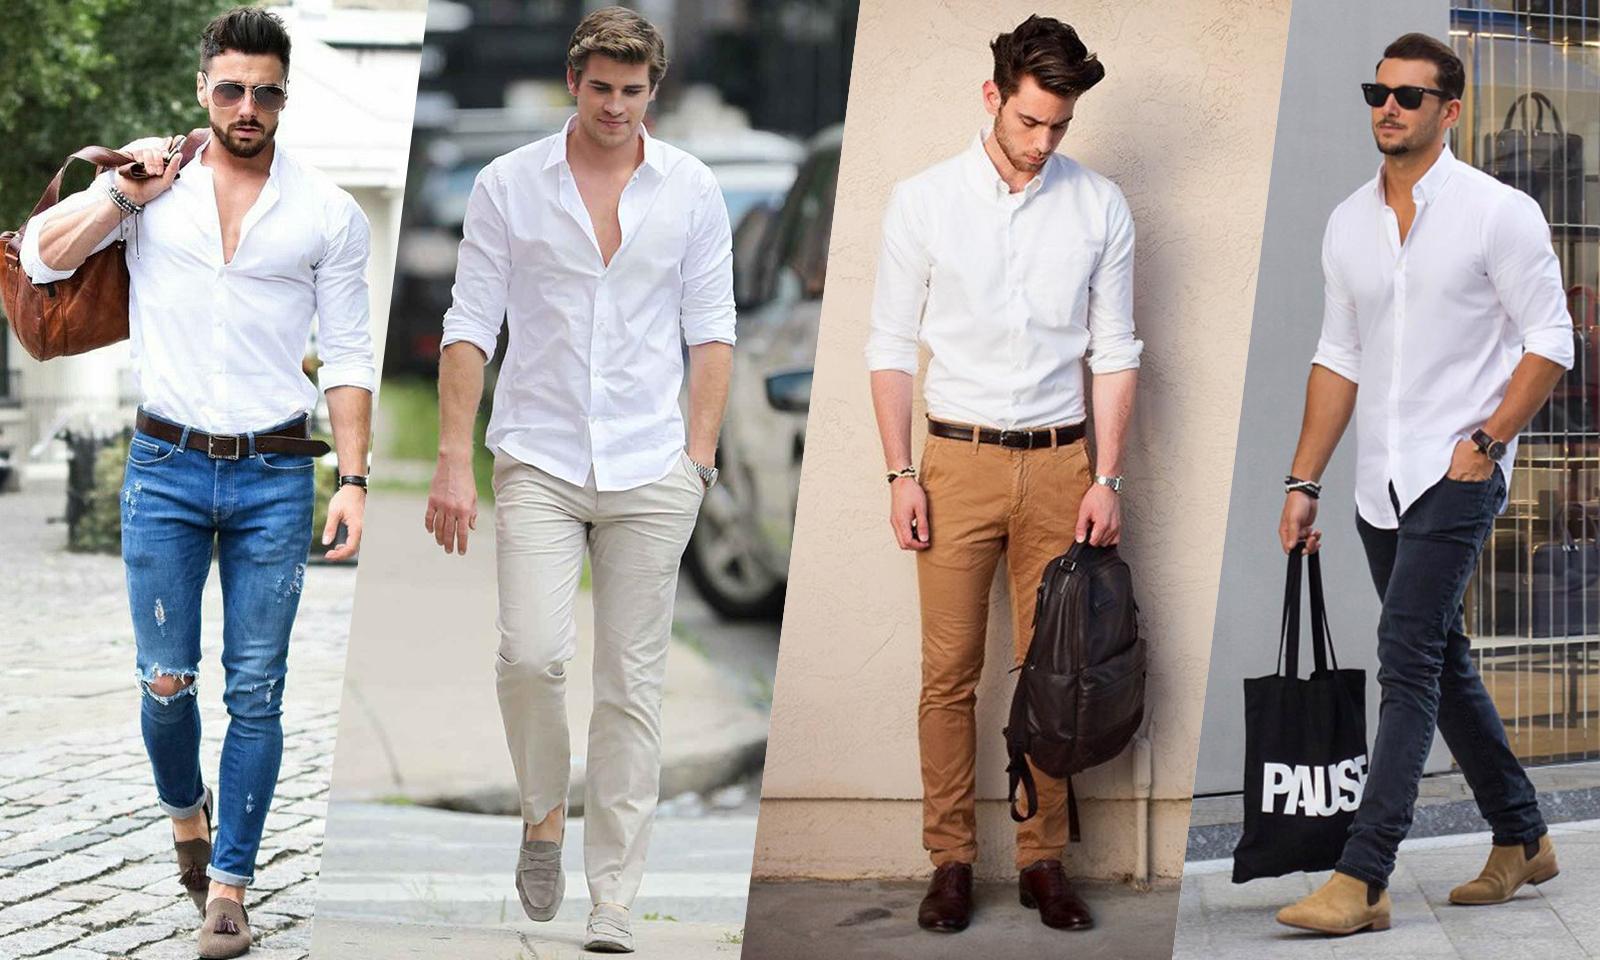 chemise blanche pas cher